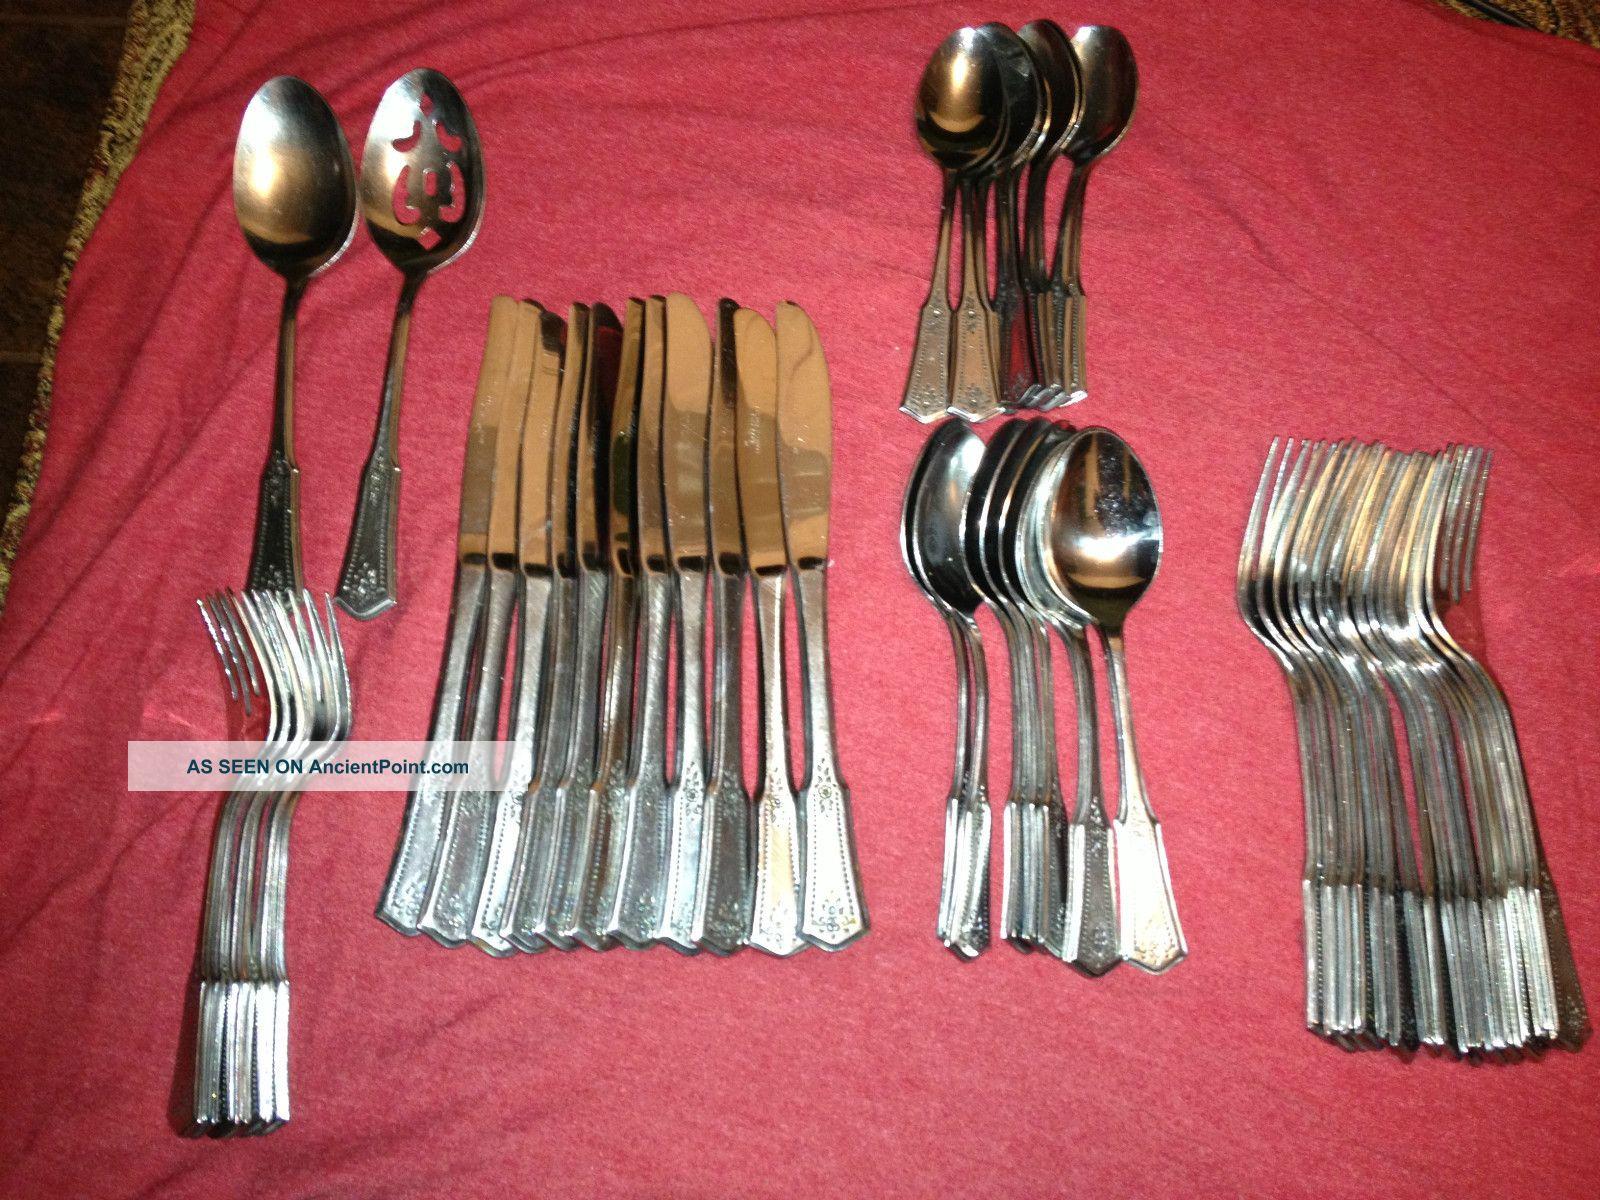 Vintage Rogers Stainless Steel Flatware Korea Brentwood (52) Piece Set Mint Oneida/Wm. A. Rogers photo